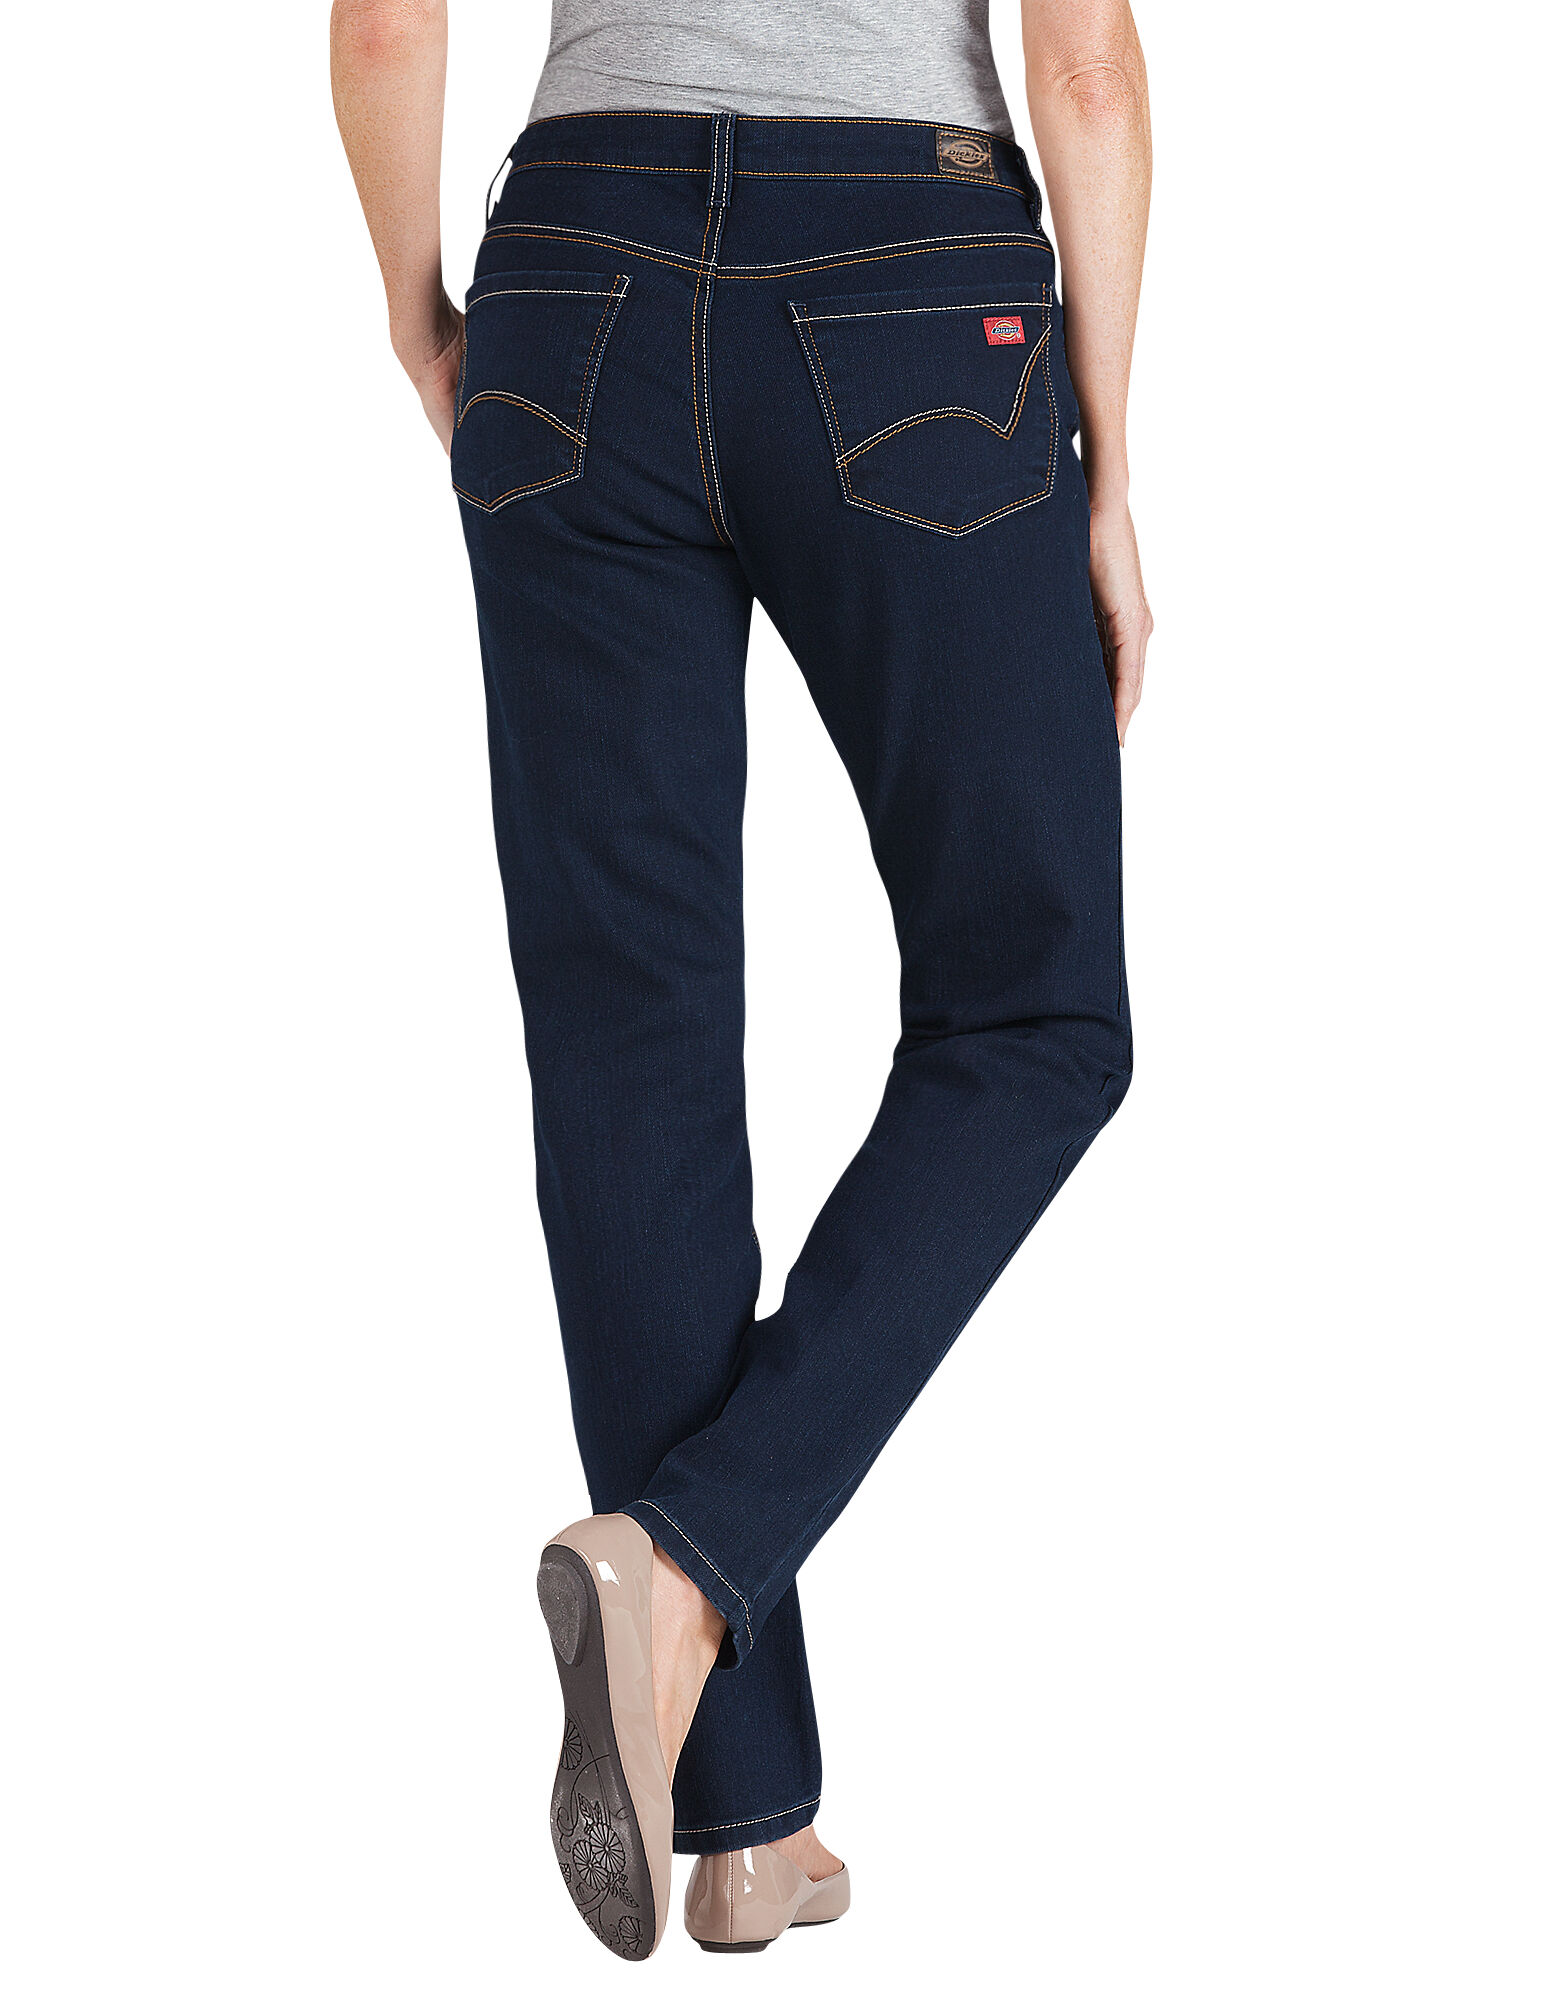 Women&39s Curvy Fit Skinny Leg Denim Jean | Womens Jeans | Dickies